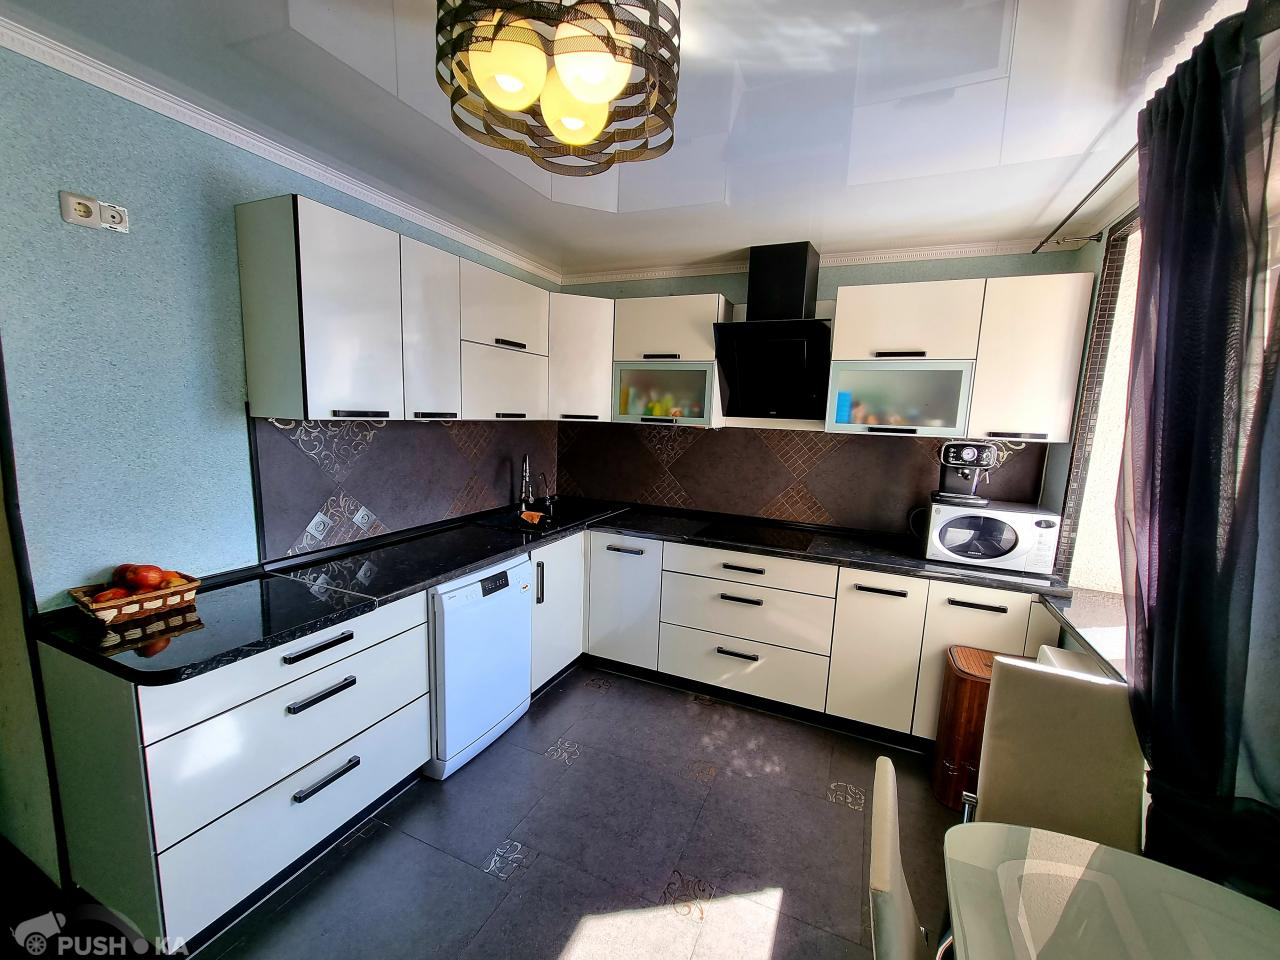 Продаётся 2-комнатная квартира 68.0 кв.м. этаж 9/10 за 4 400 000 руб